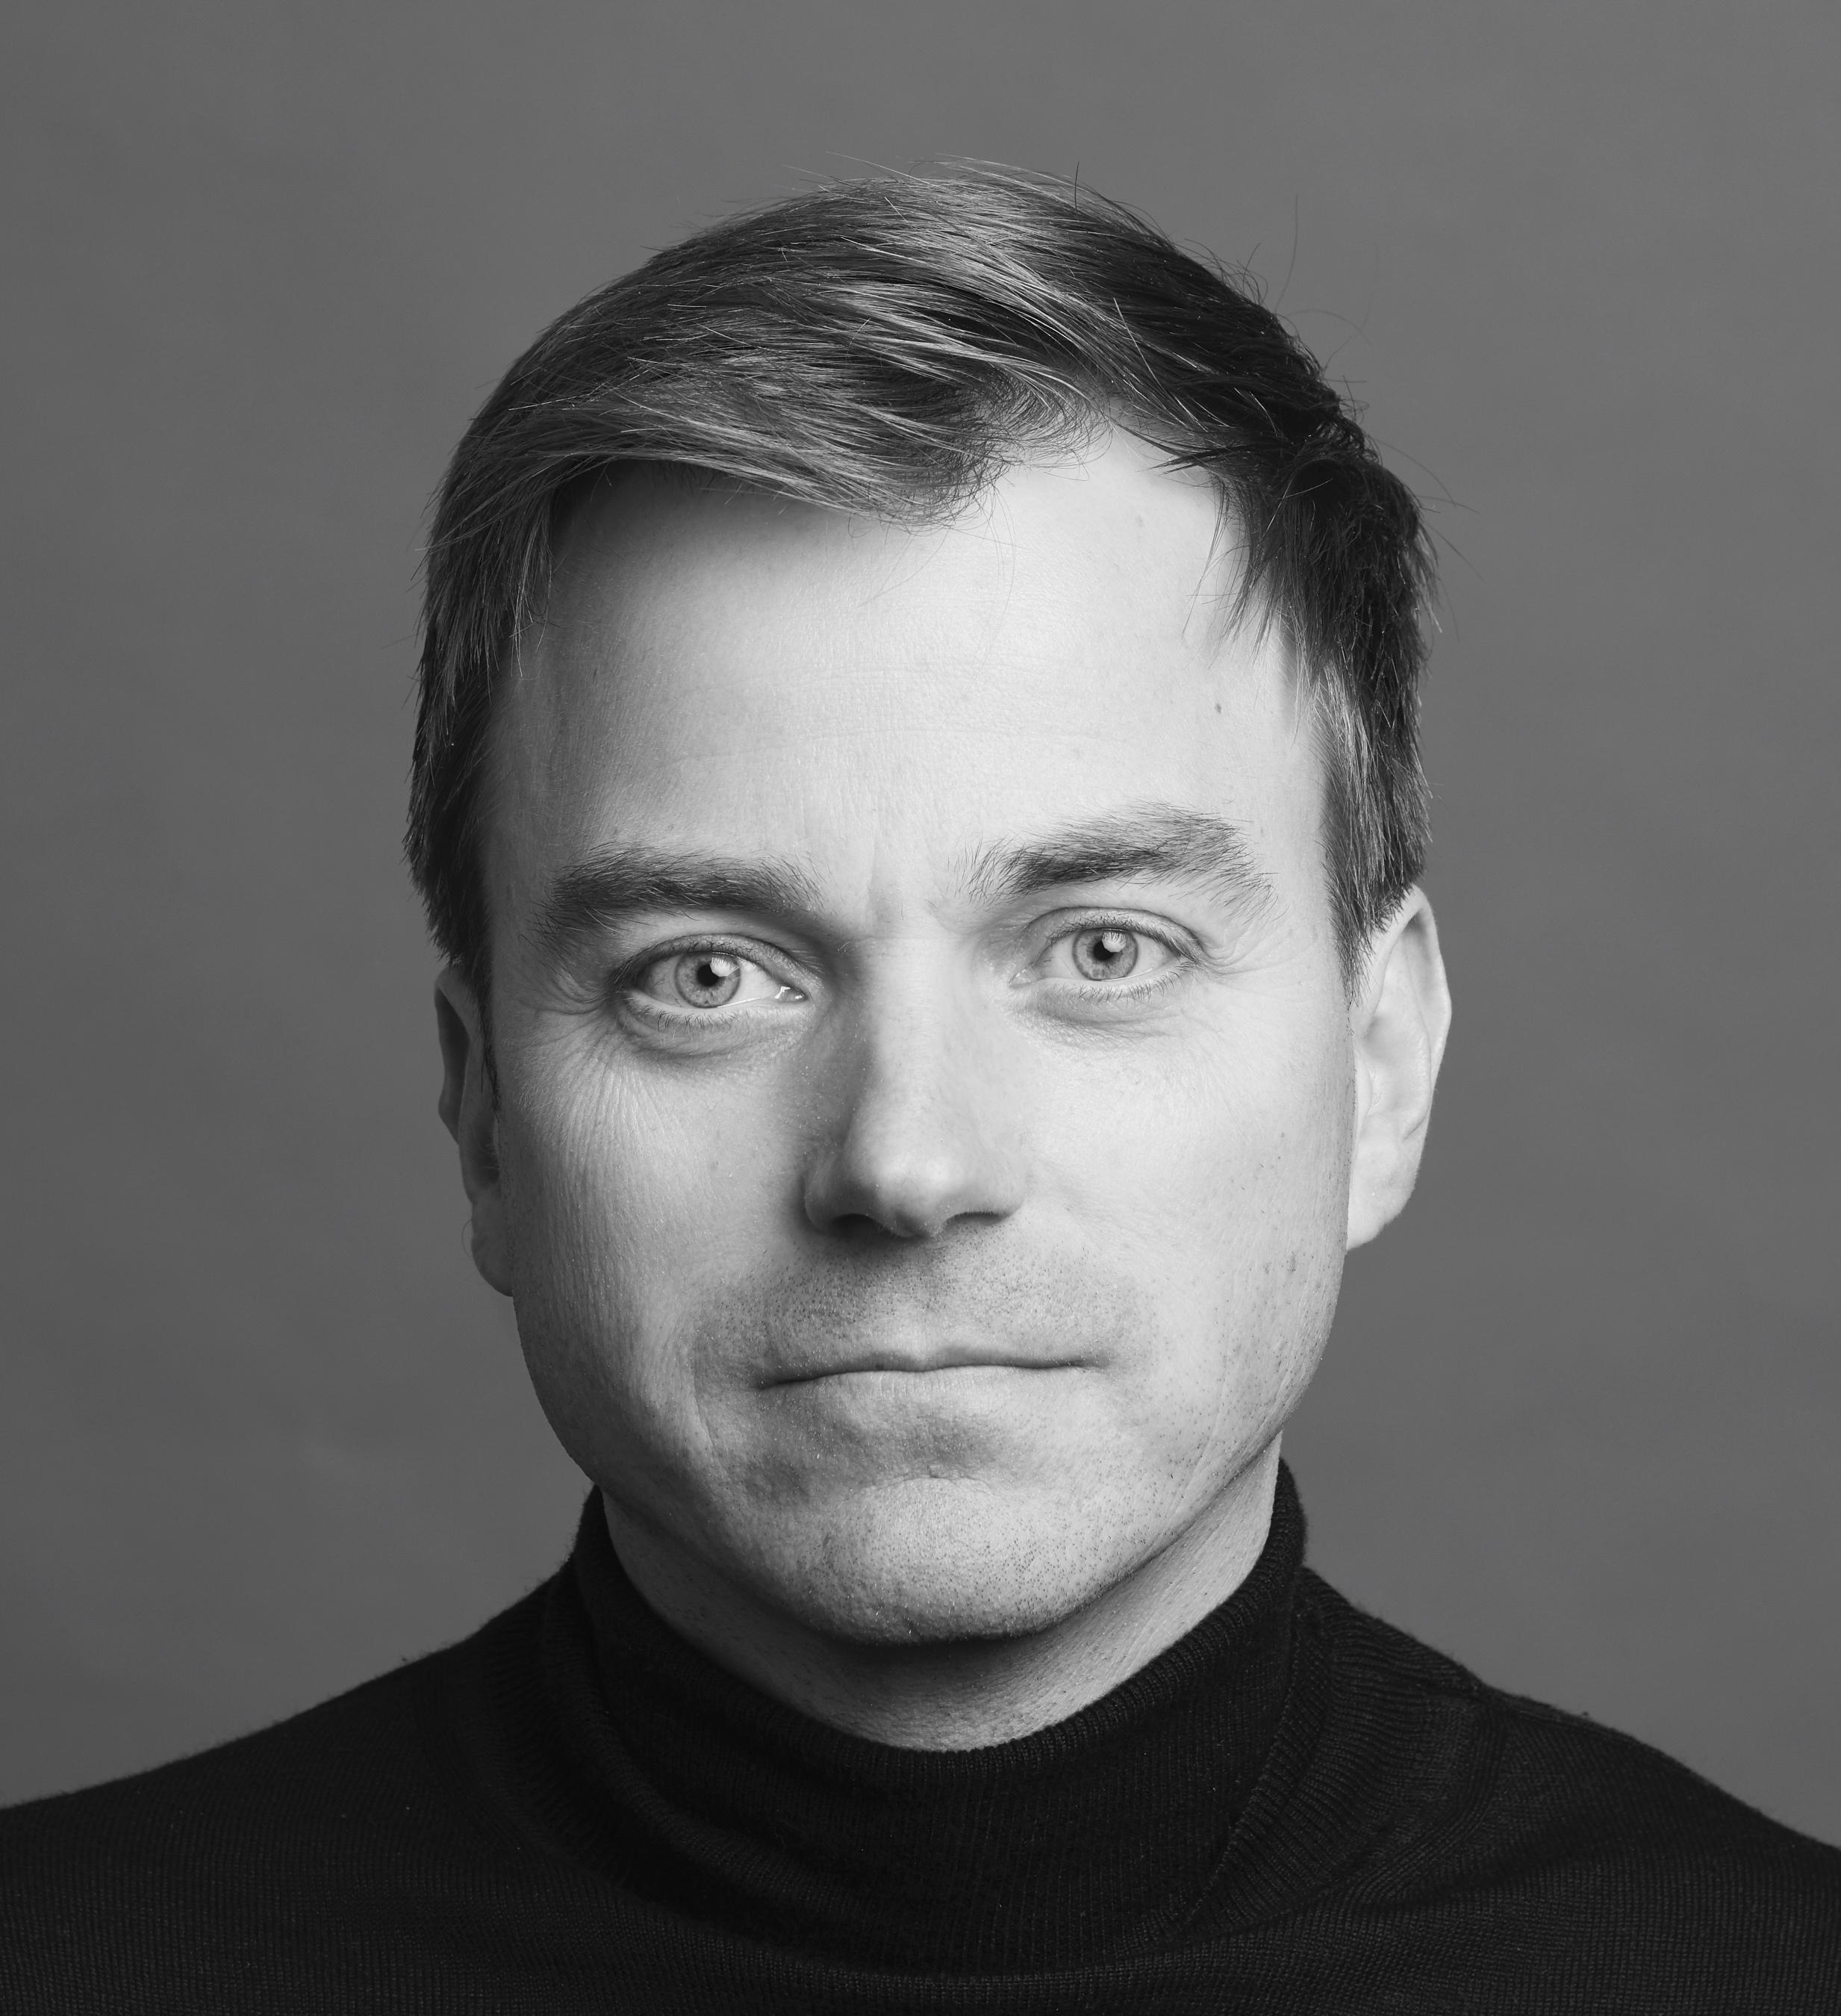 Roger Wallgren, principal engineer, vehicle dynamics, Polestar